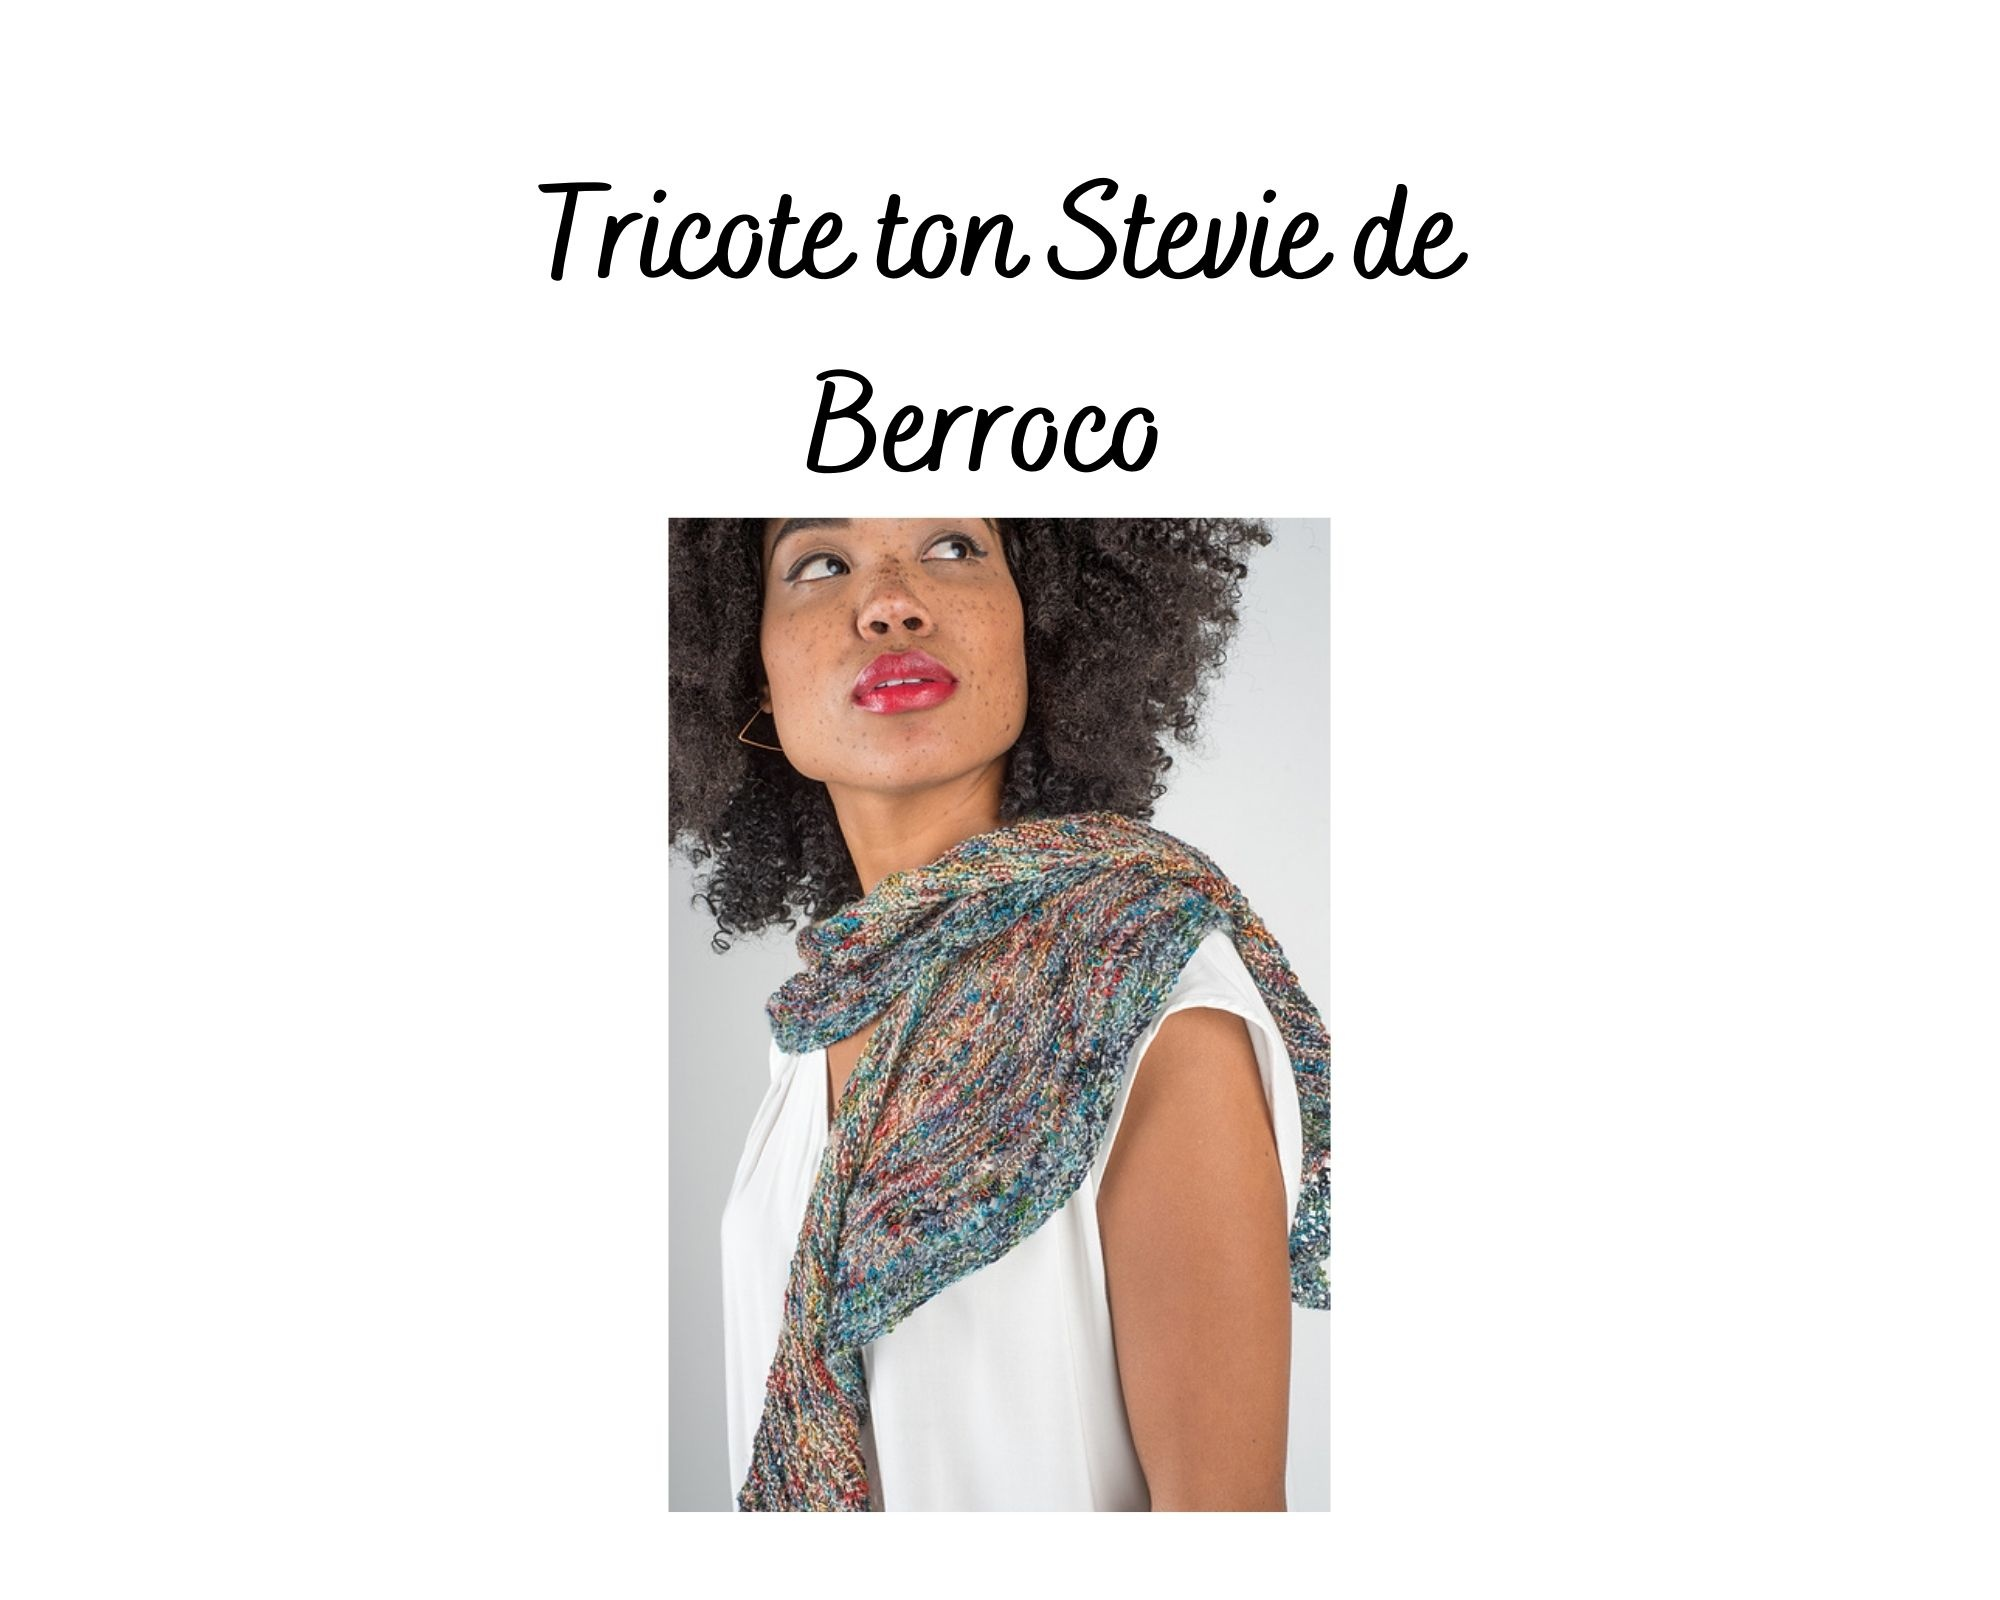 Berroco Tricote ton Stevie